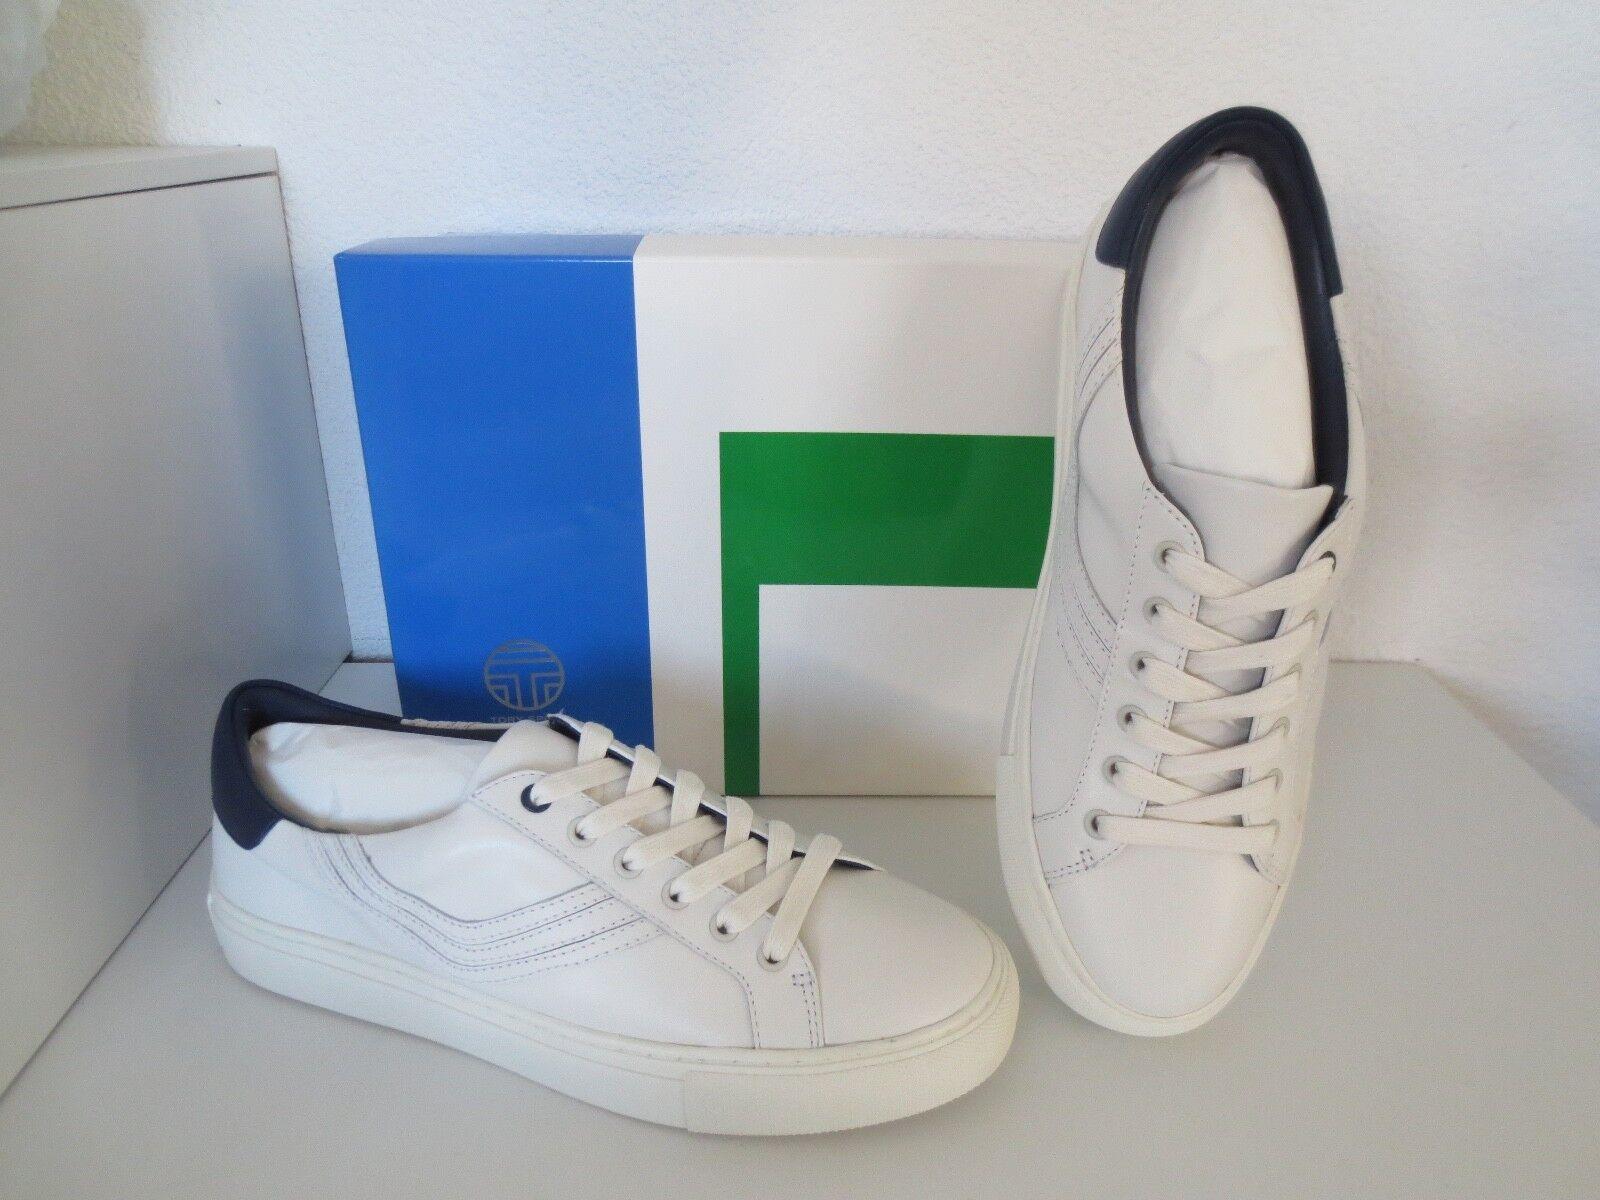 TORY BURCH  CHEVRON BLOCK Sneakers Gr.40 Navy US 9 Weiß / Navy Gr.40 Schuhe Sneaker neu 9bd8b7